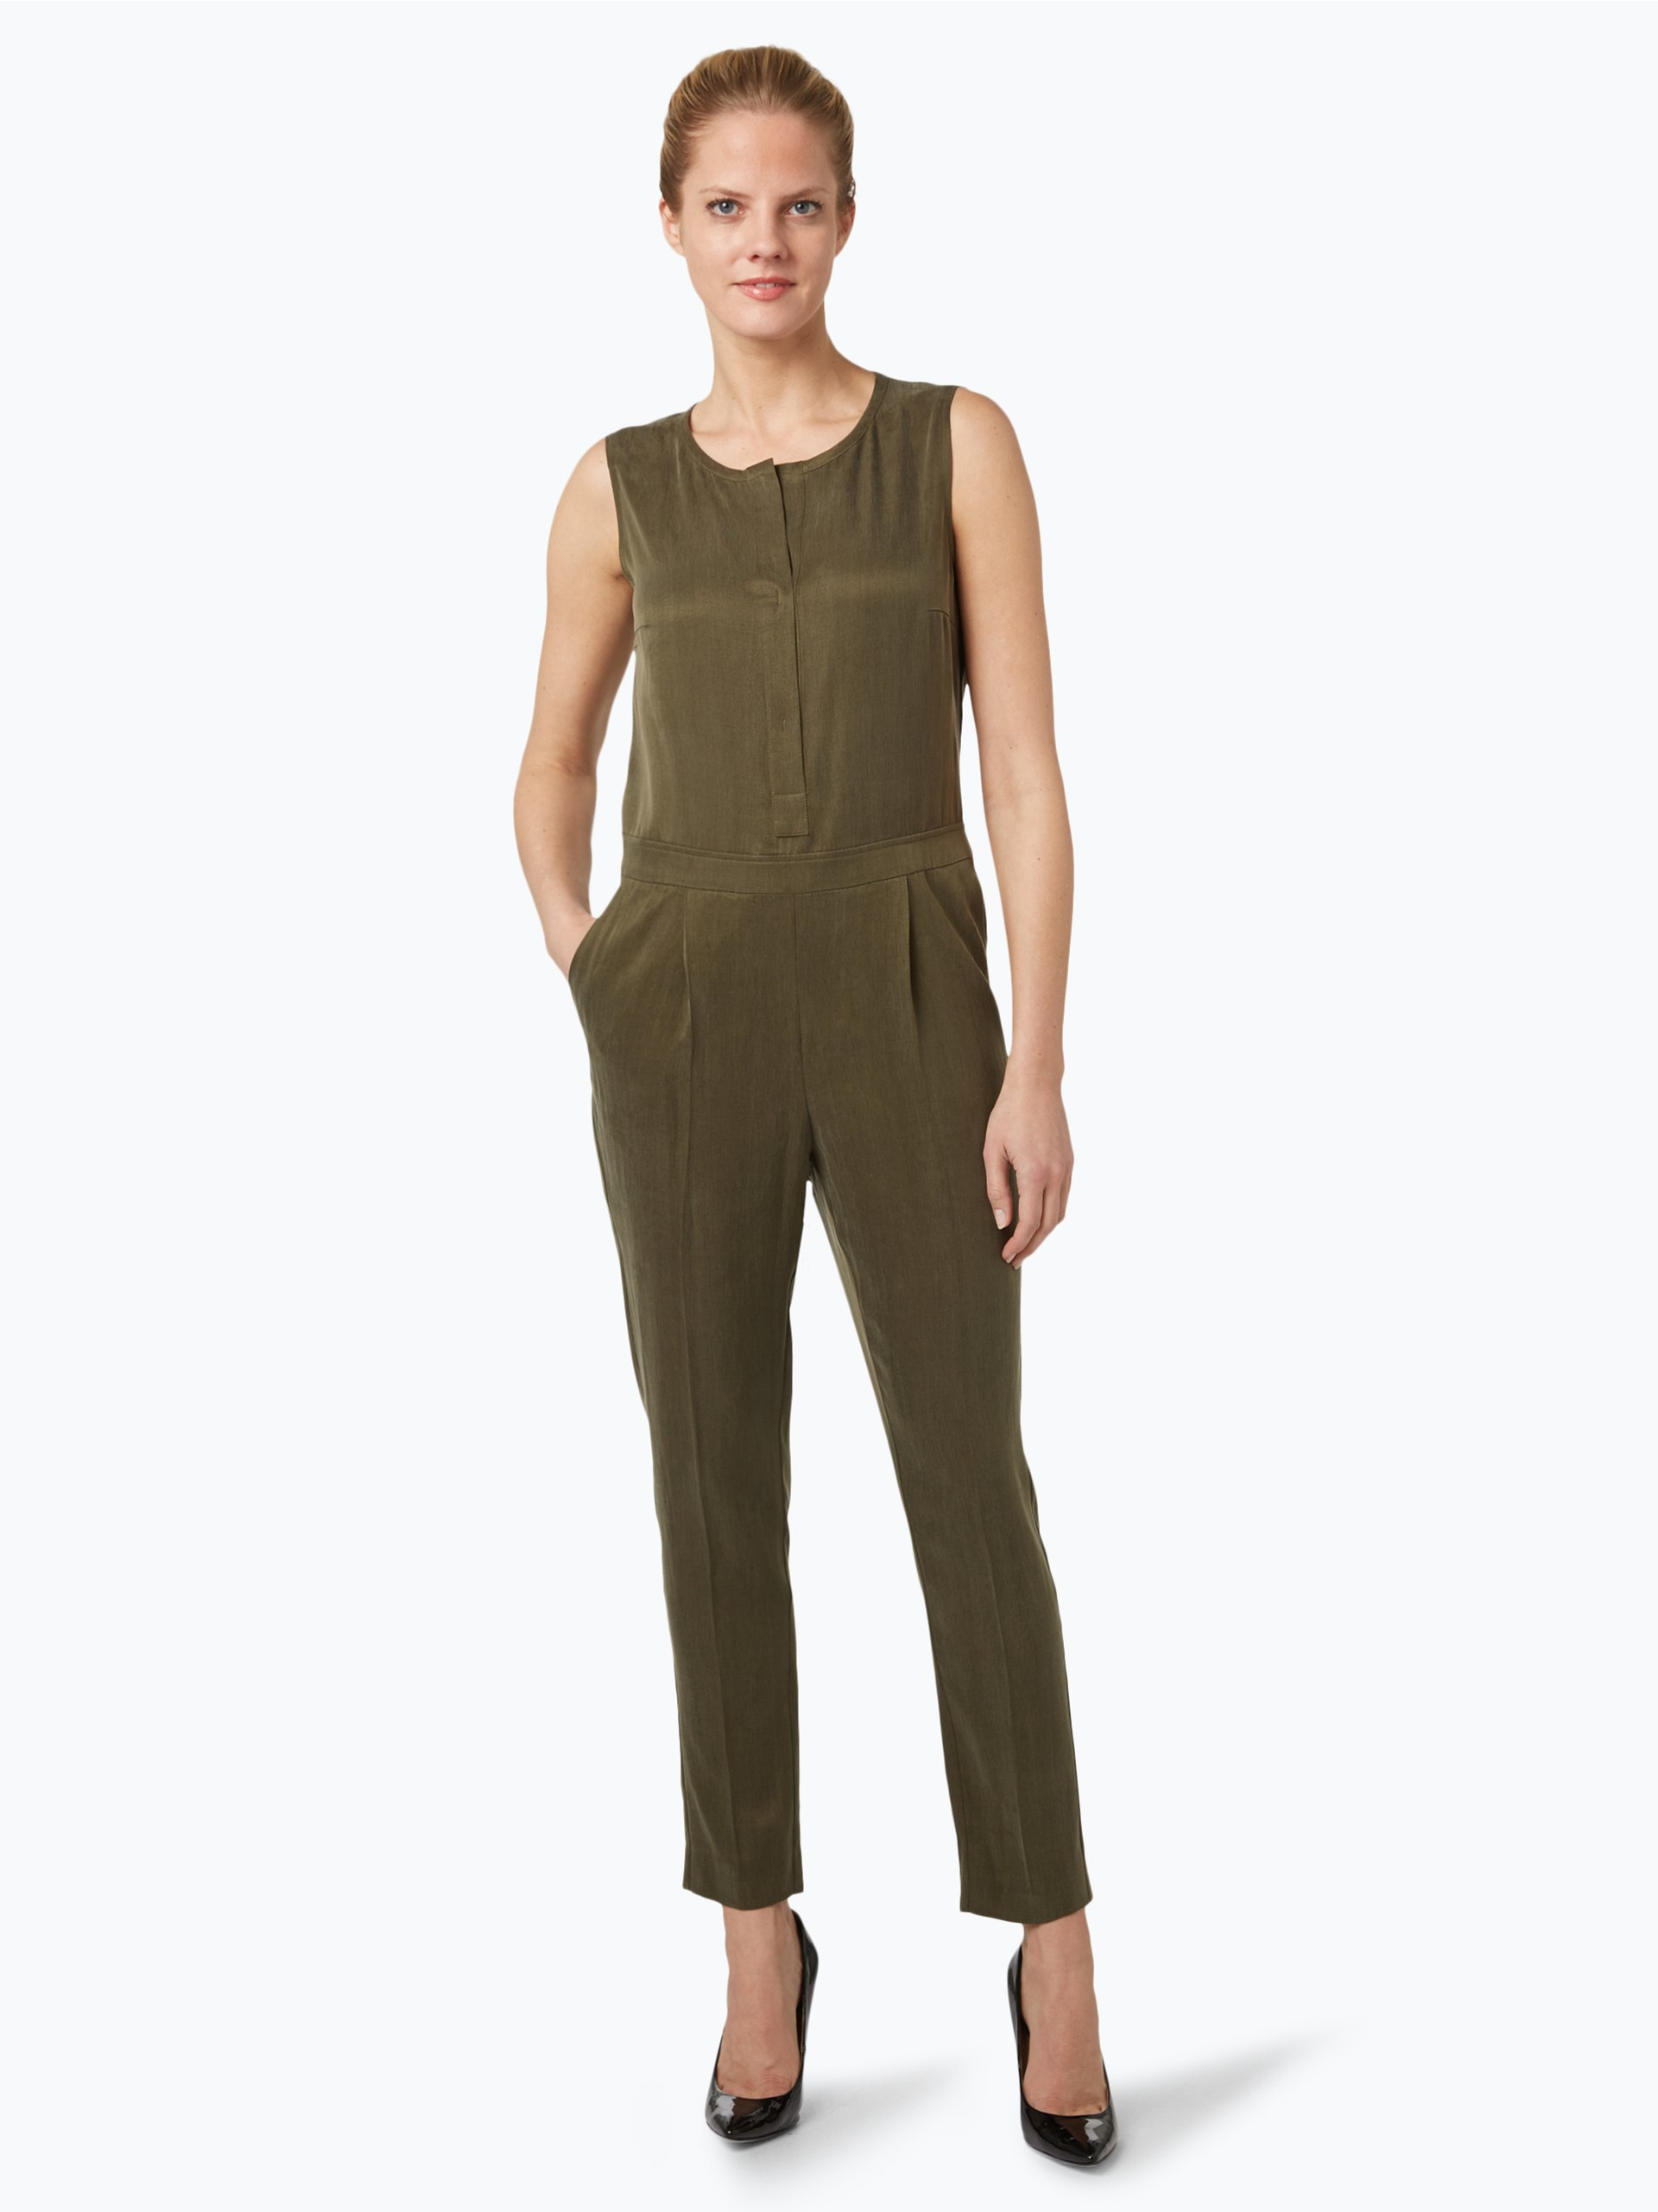 apriori damen jumpsuit wei uni online kaufen vangraaf com. Black Bedroom Furniture Sets. Home Design Ideas